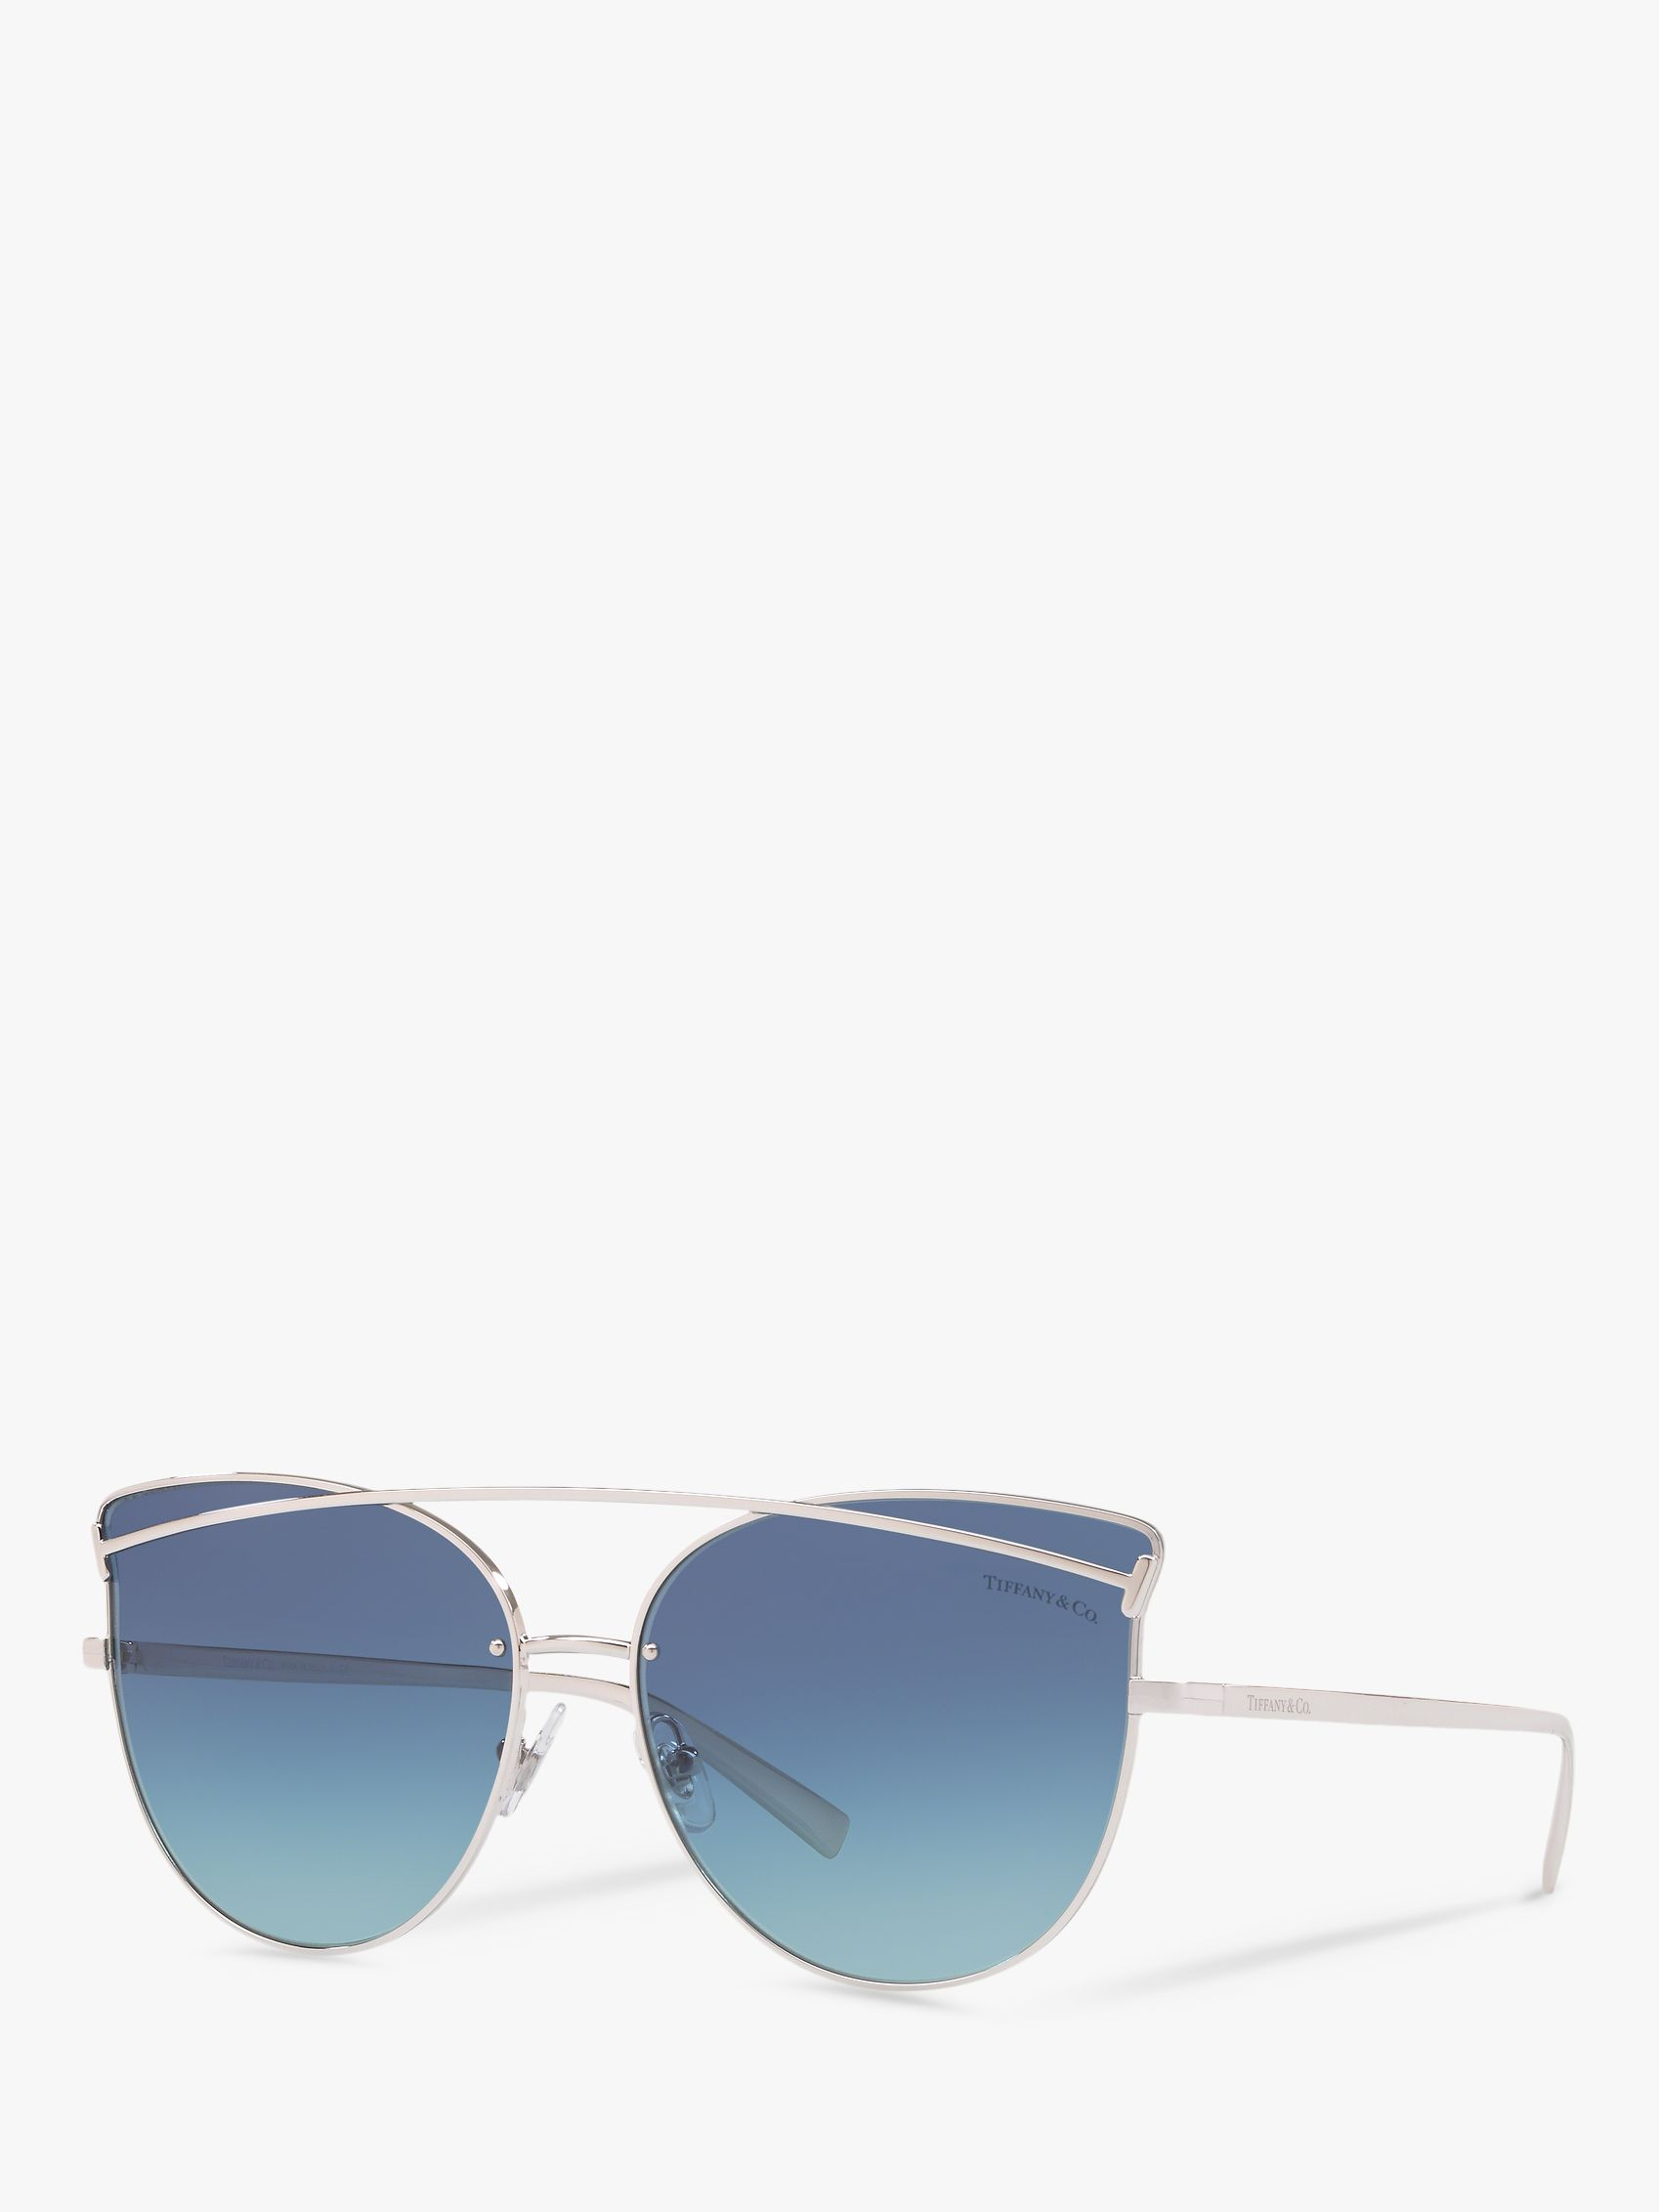 Tiffany & Co Tiffany & Co TF3064 Women's Cat's Eye Sunglasses, Silver/Blue Gradient